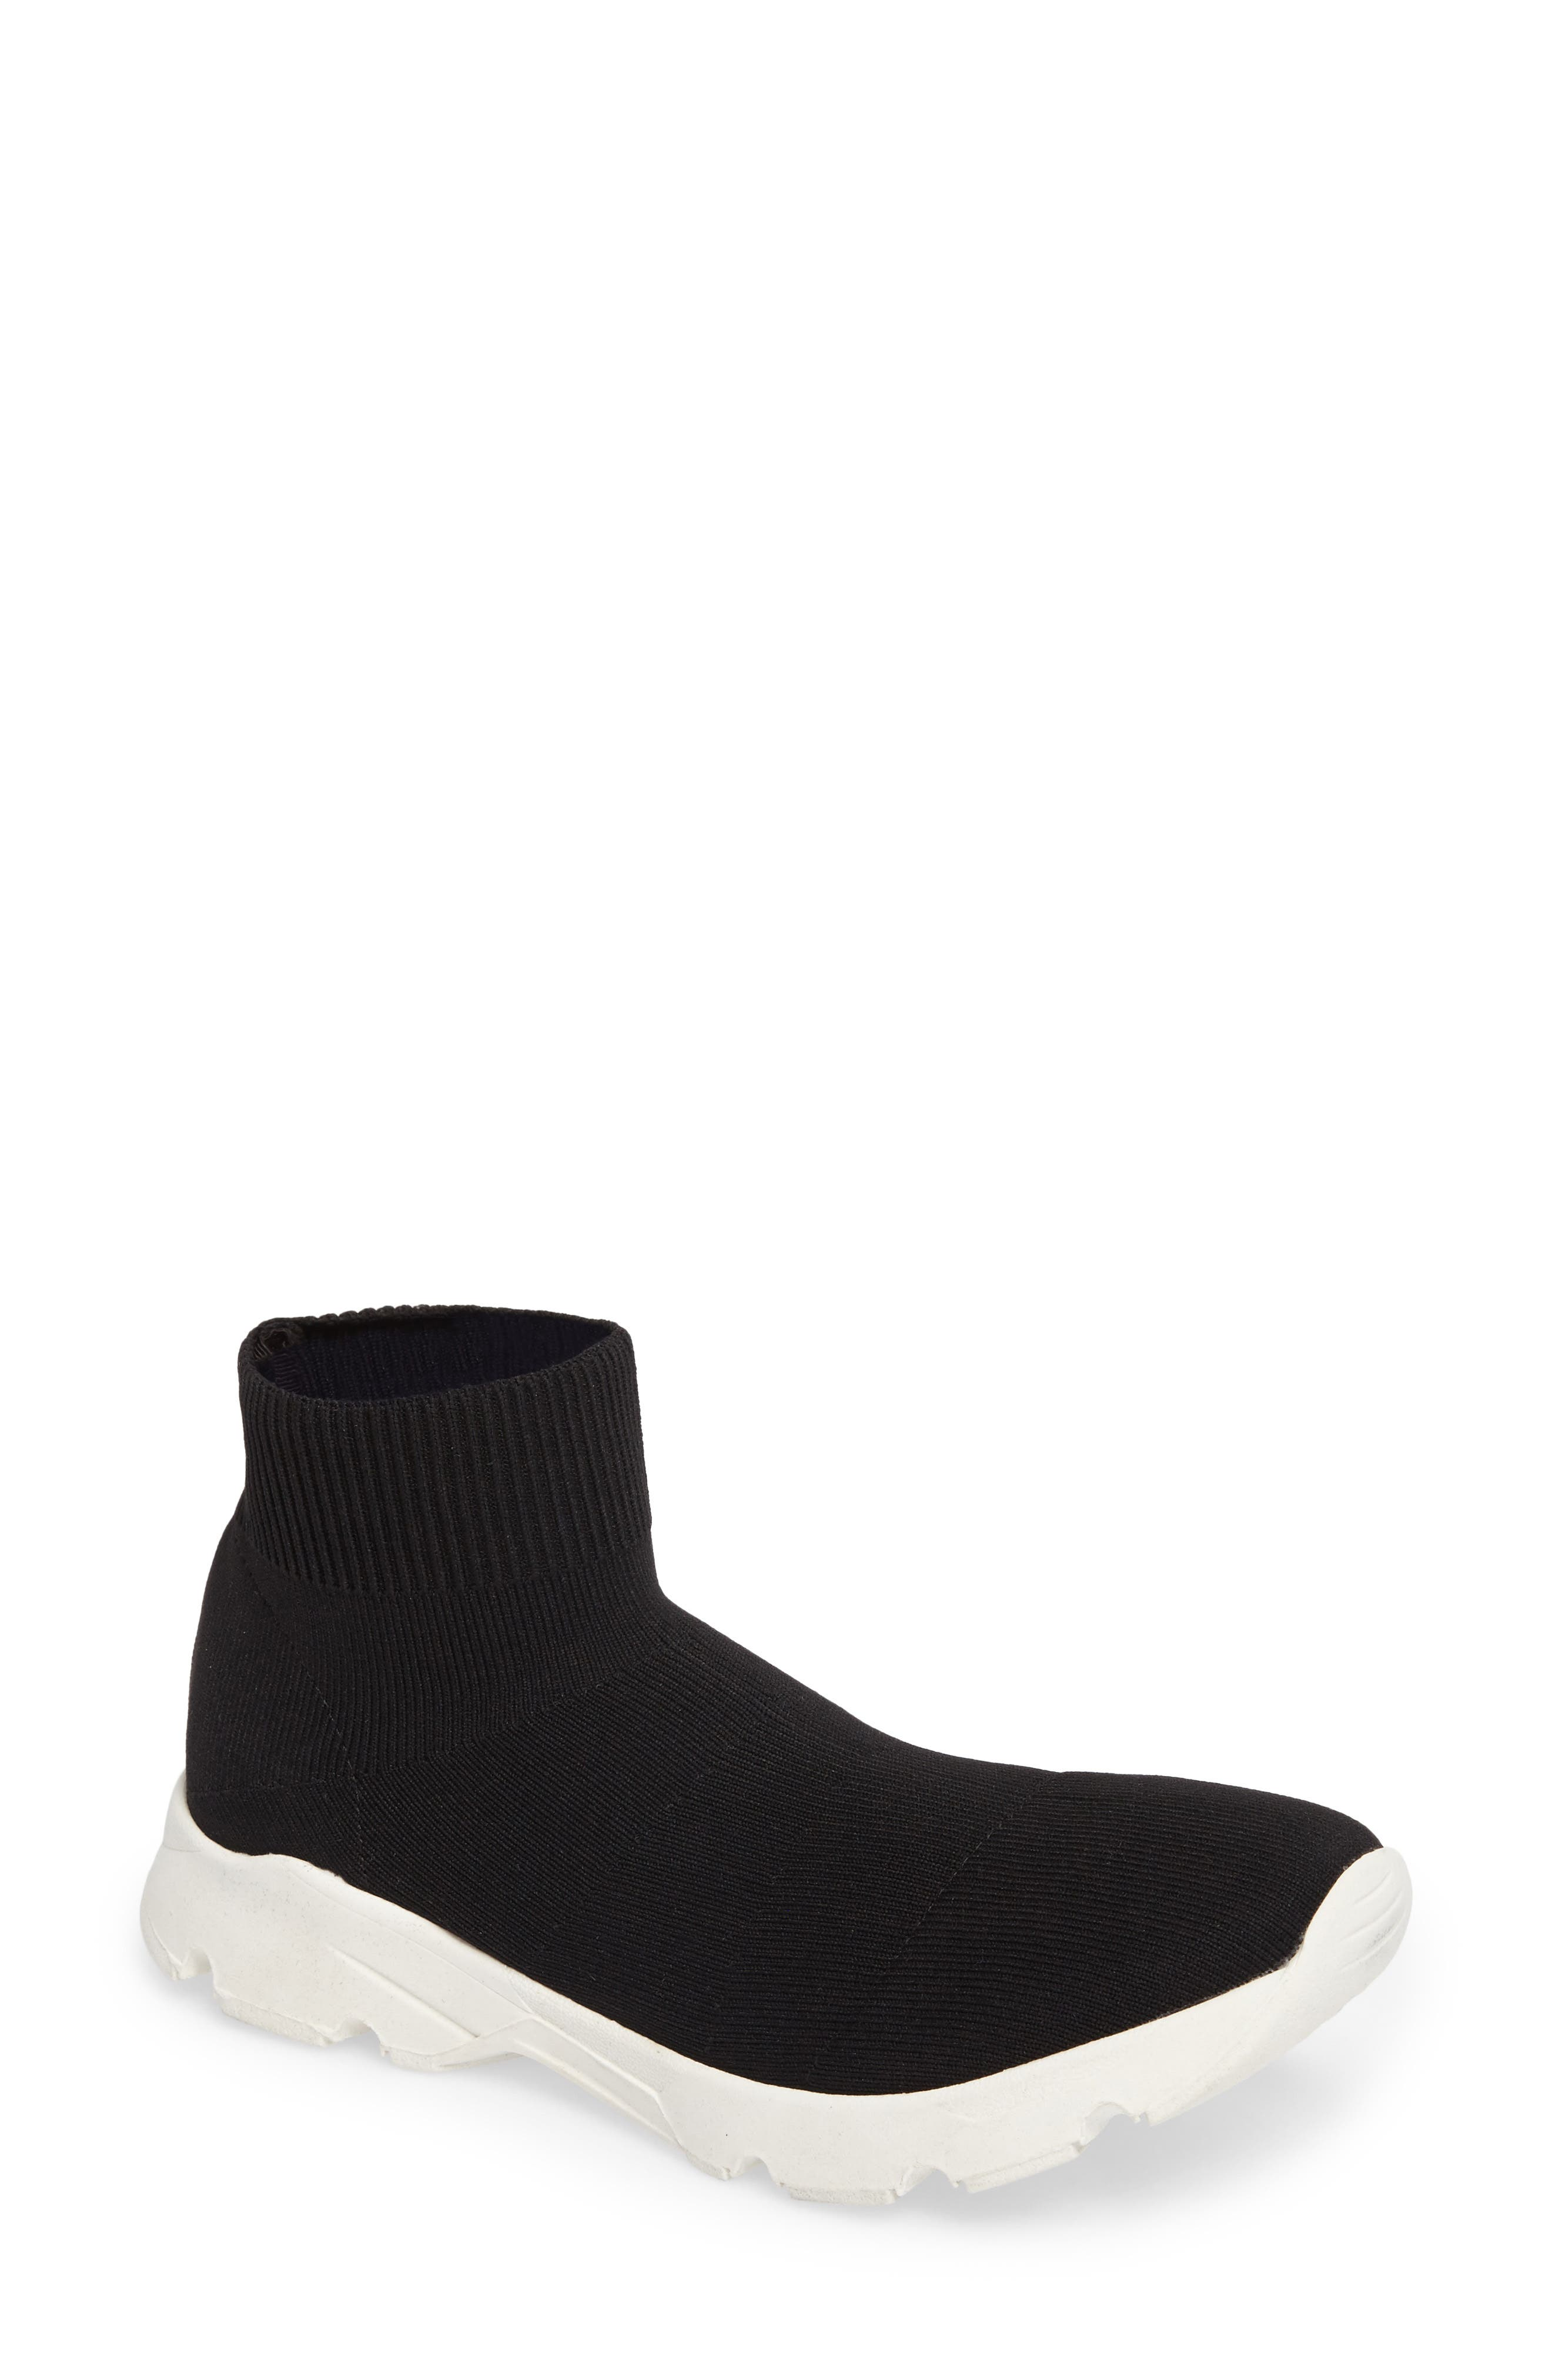 Winston Knit High Top Sneaker,                             Main thumbnail 1, color,                             001